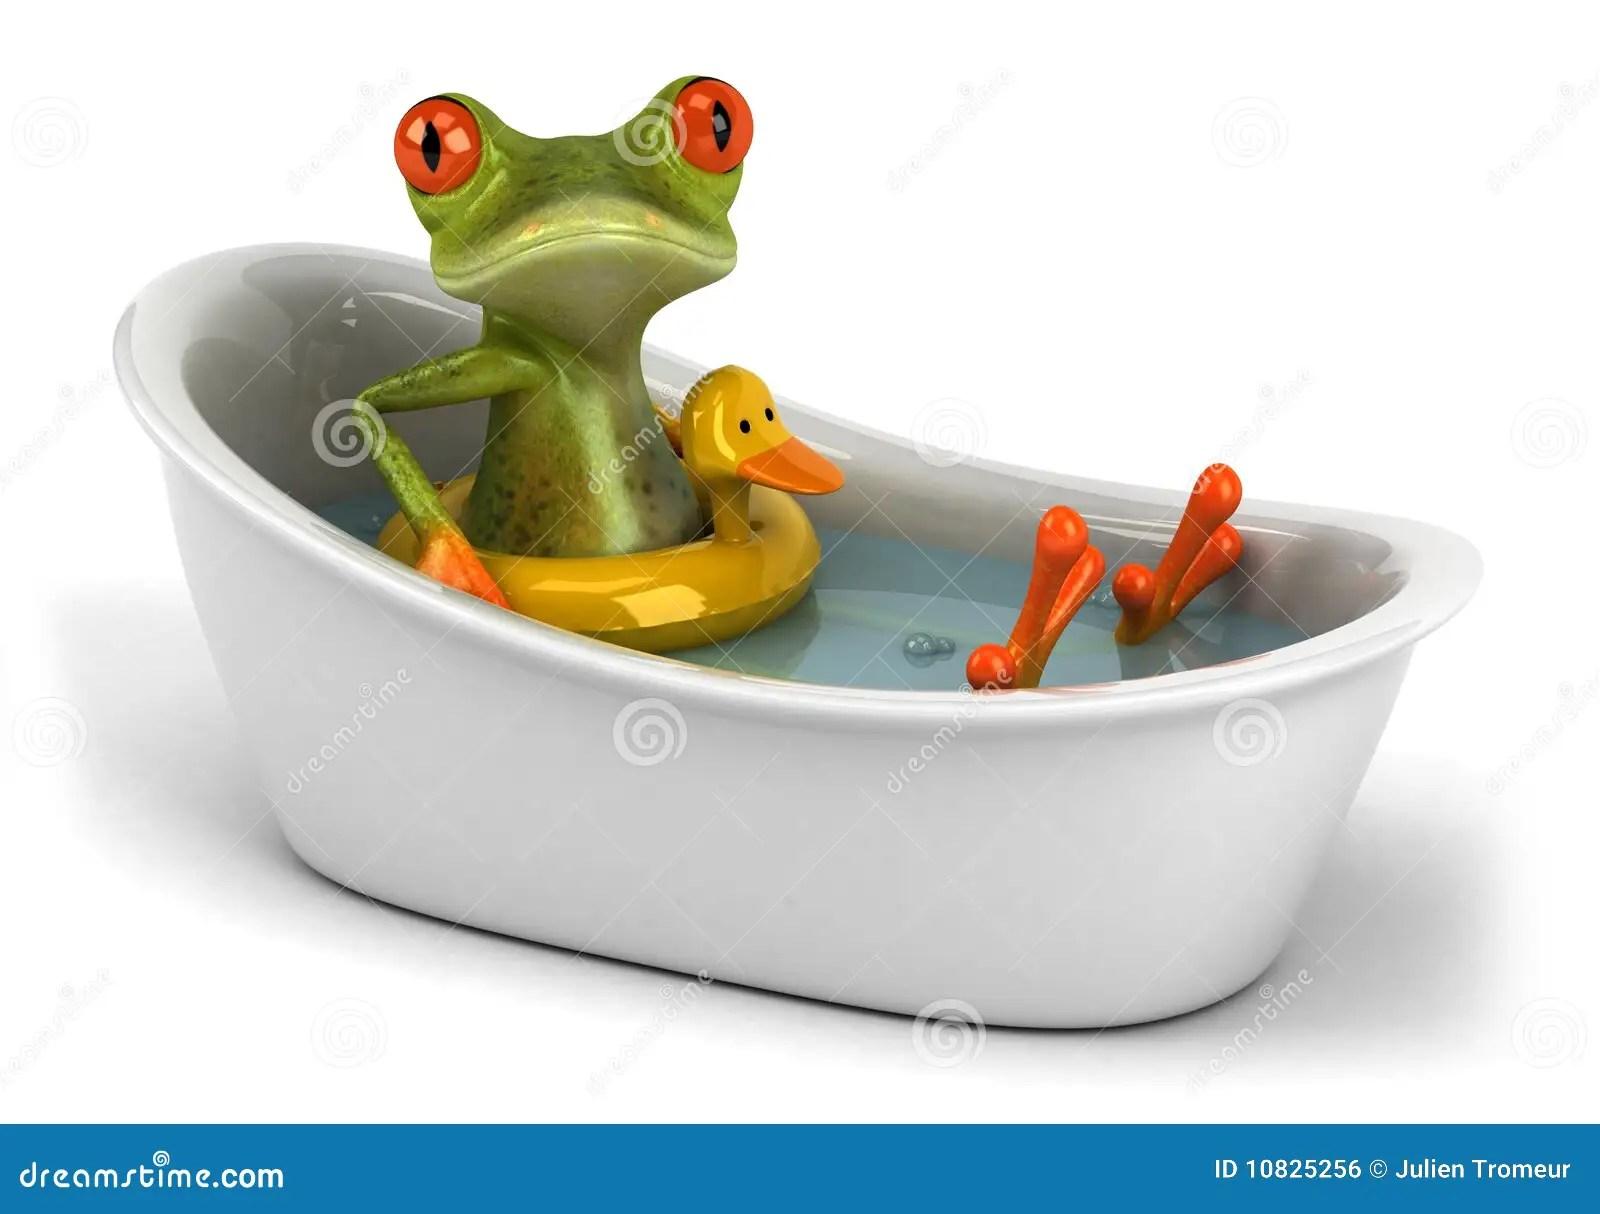 Cute Aqua Green Wallpaper Frog In A Bath Stock Illustration Image Of Illustration